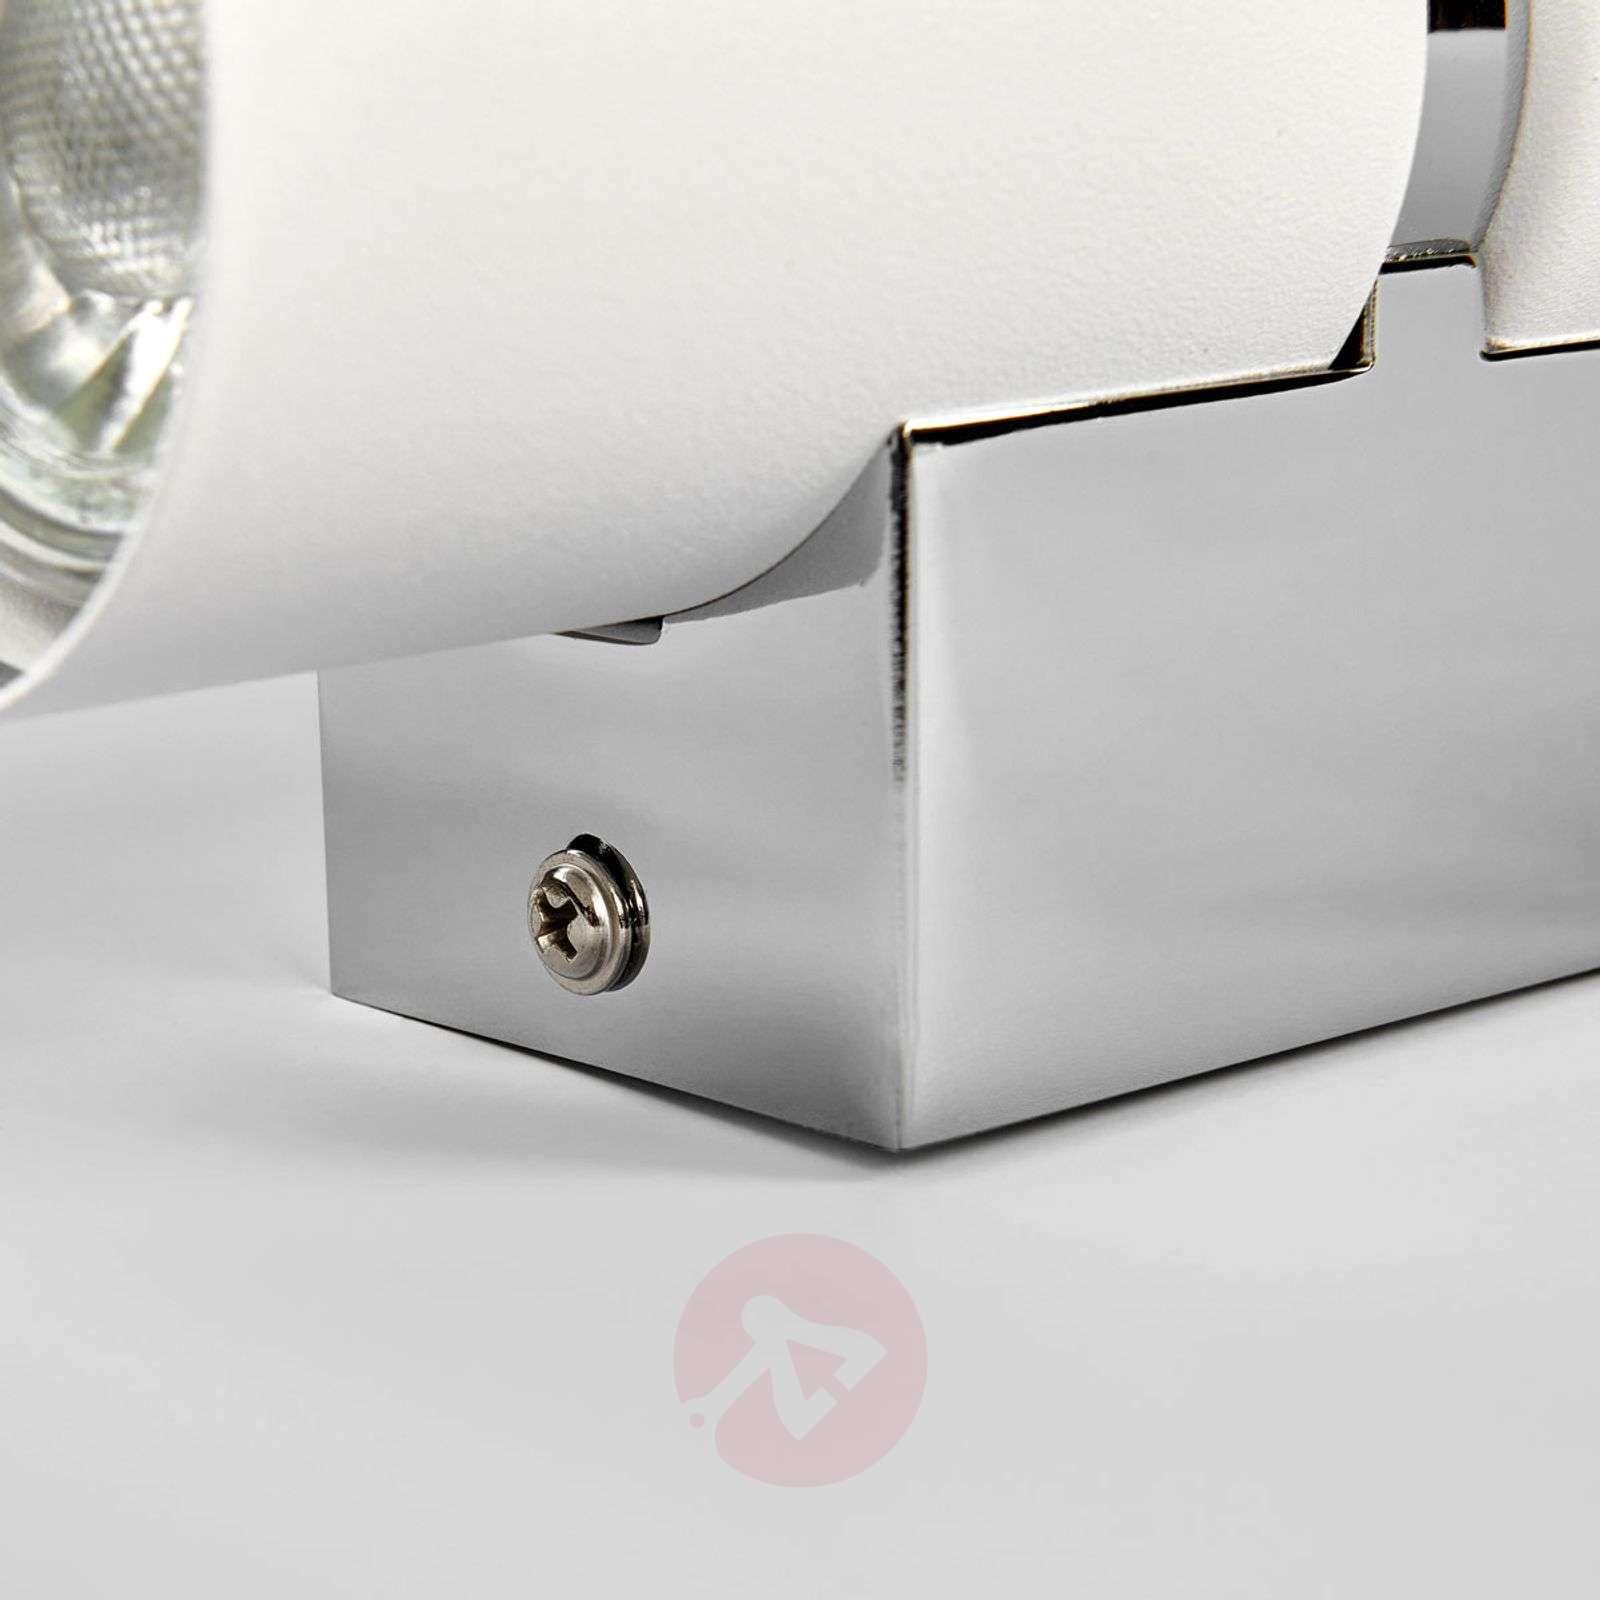 Two-bulb LED wall light Passa, round, white-3031829-01